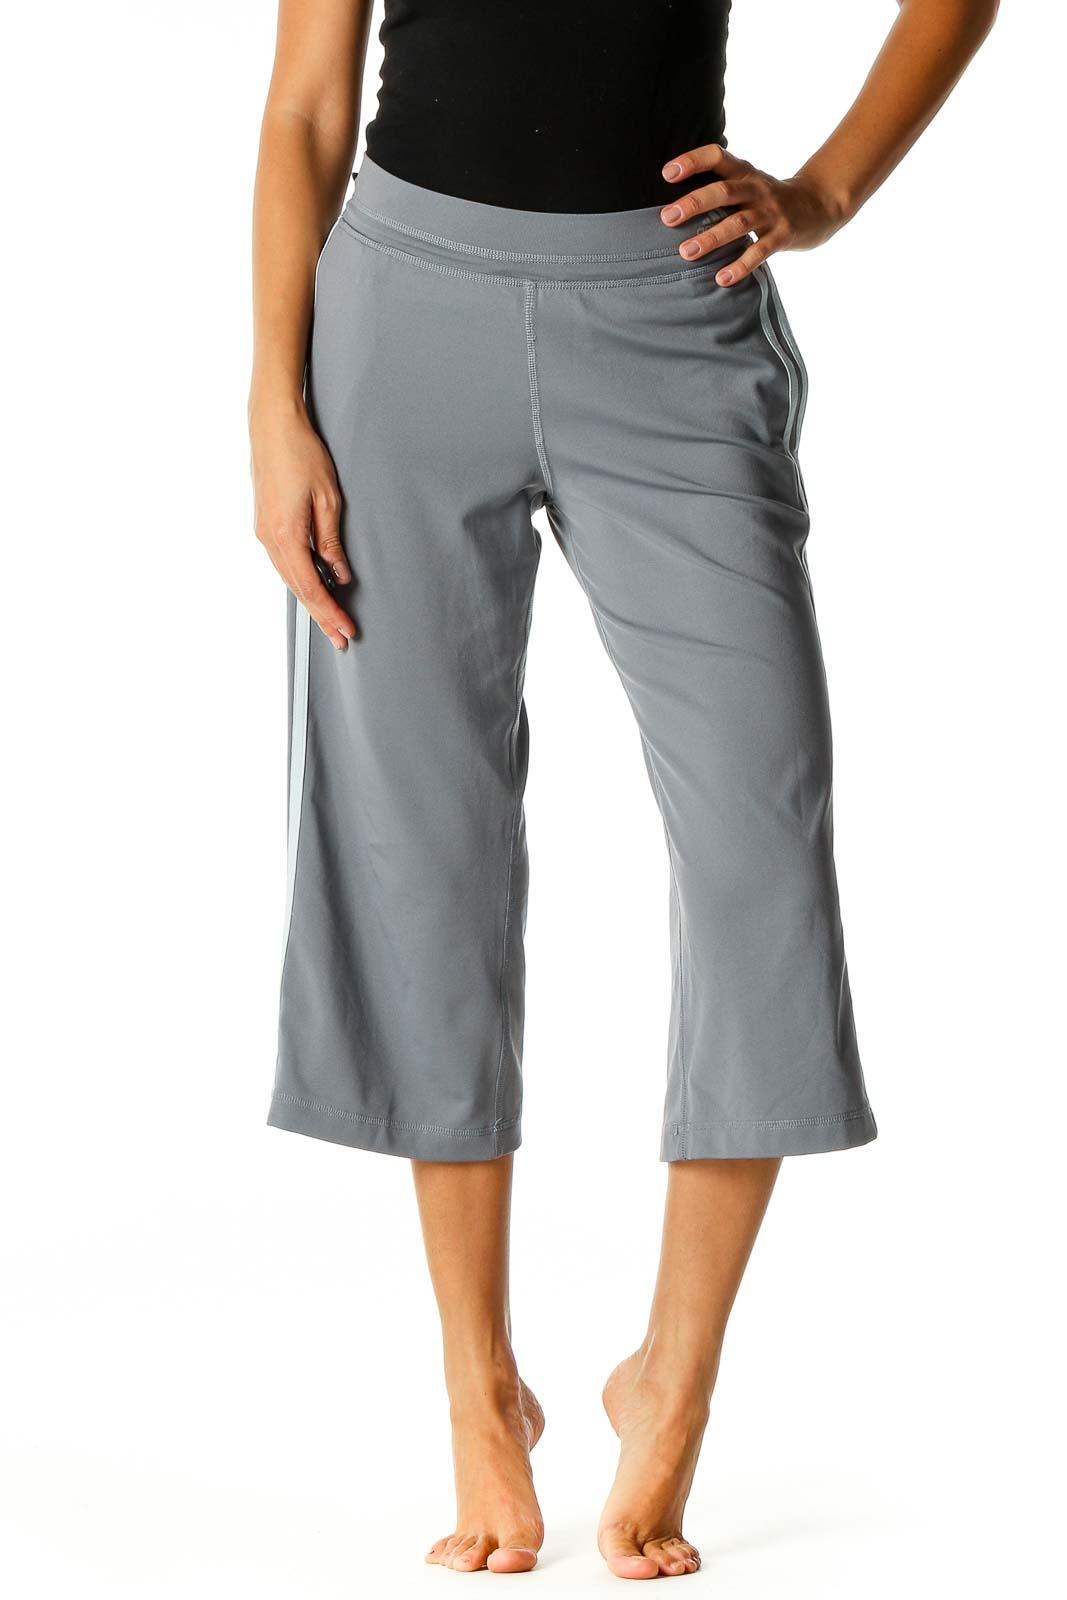 Gray Solid Activewear Capri Pants Front